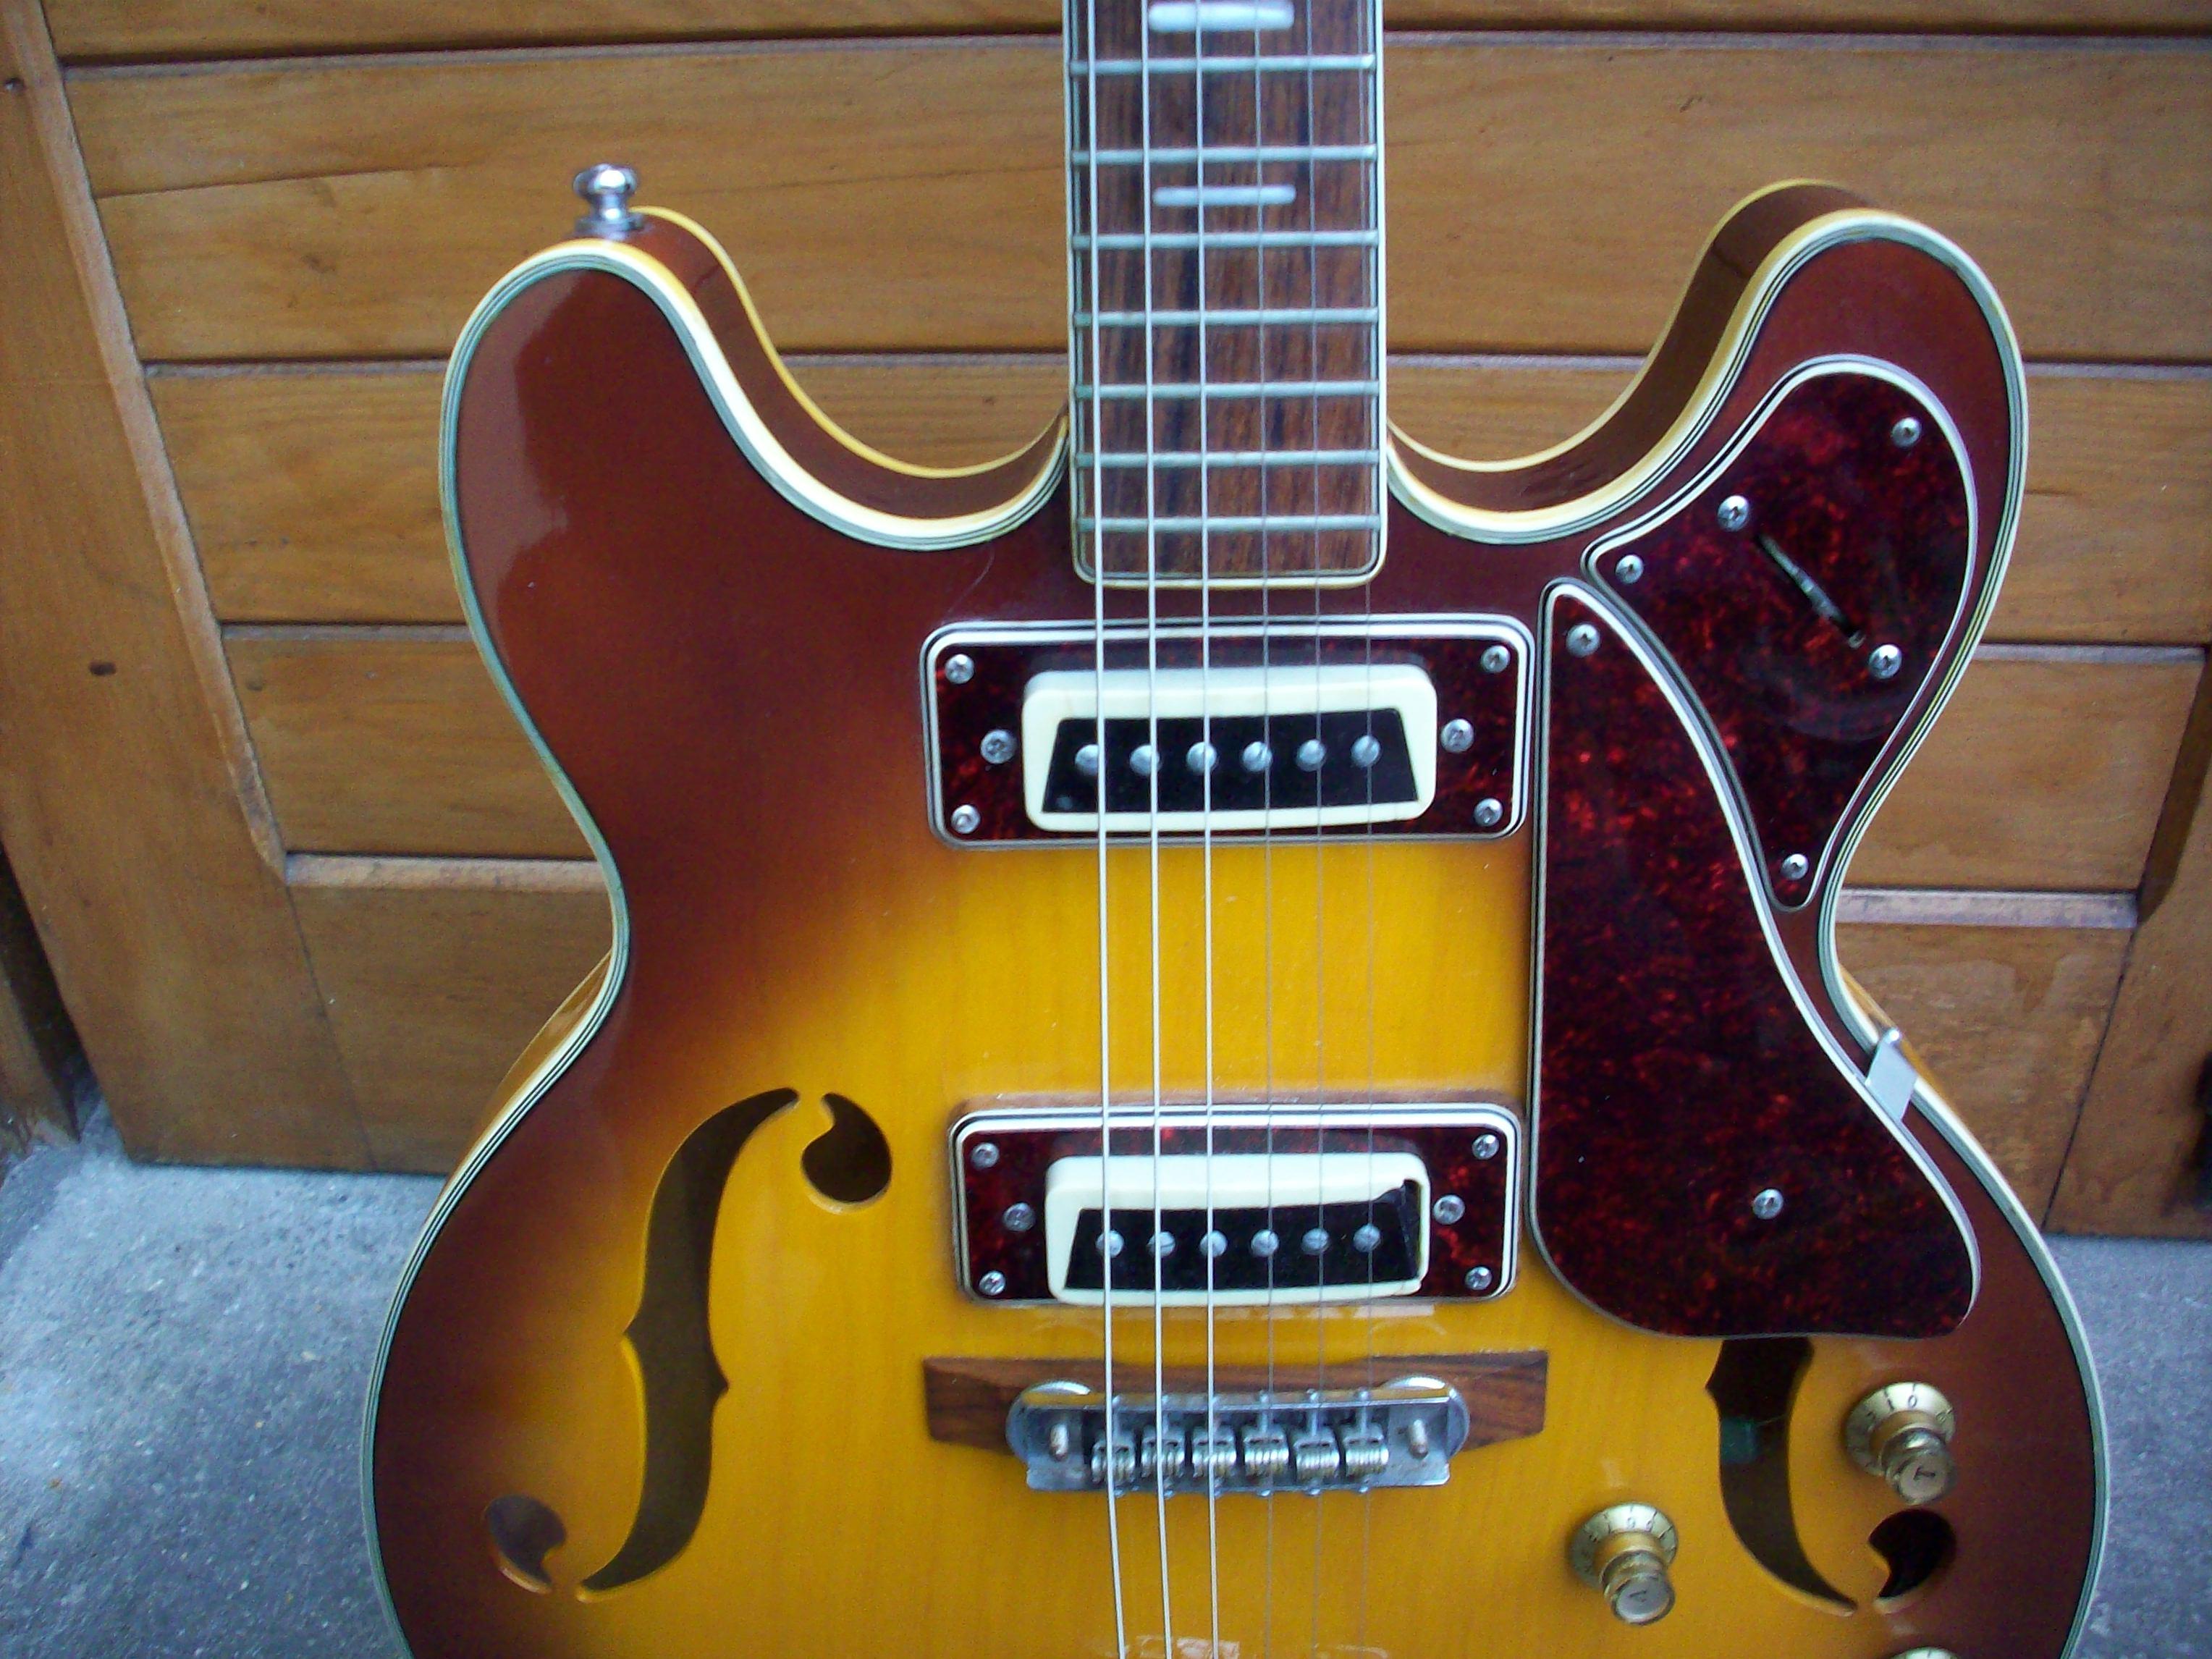 Univox guitar pickups